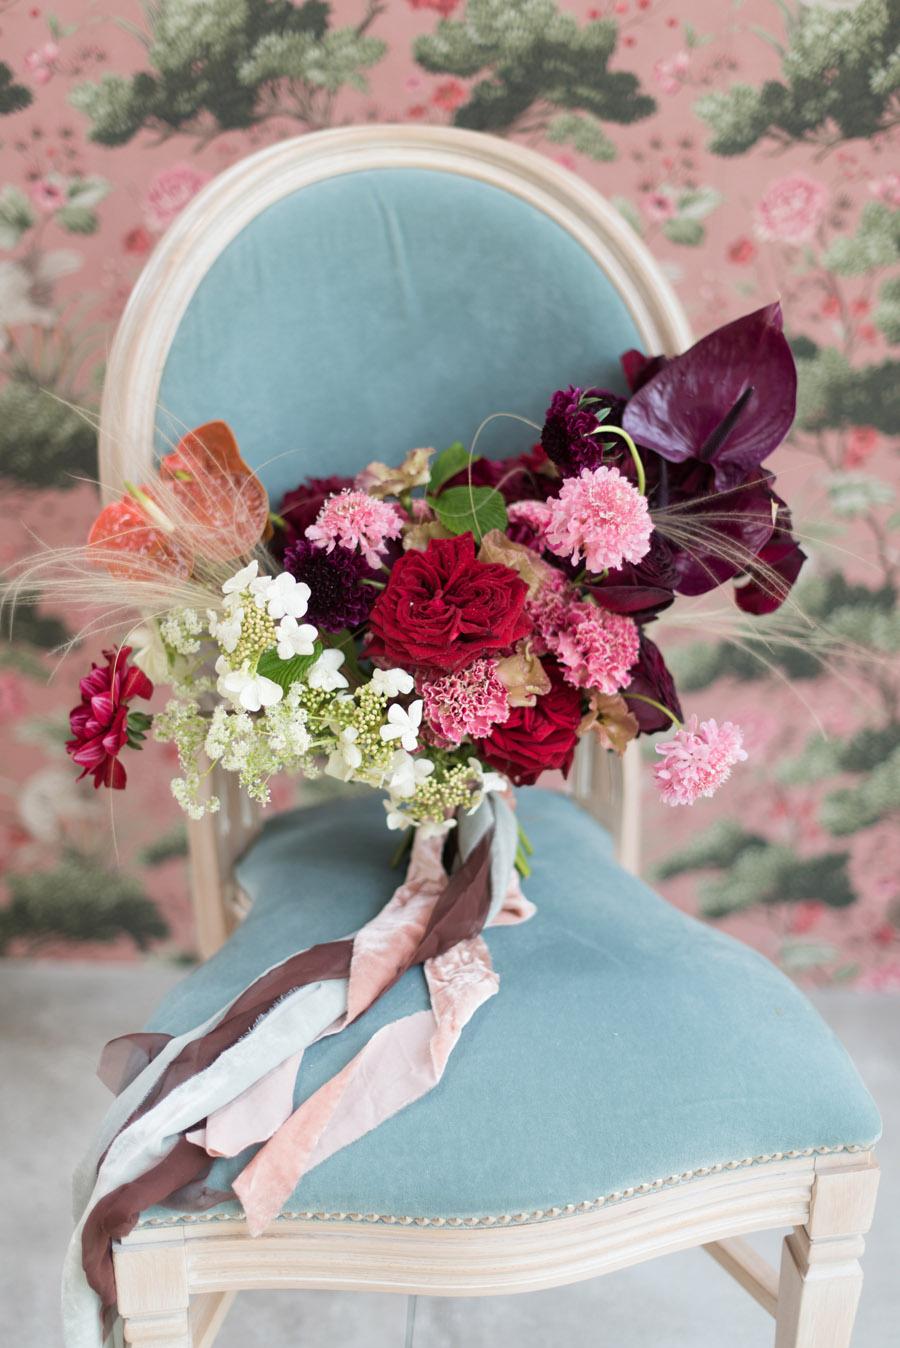 floral wedding ideas at Millbridge Court on English Wedding - photo credit Julie Michaelsen Photography (20)